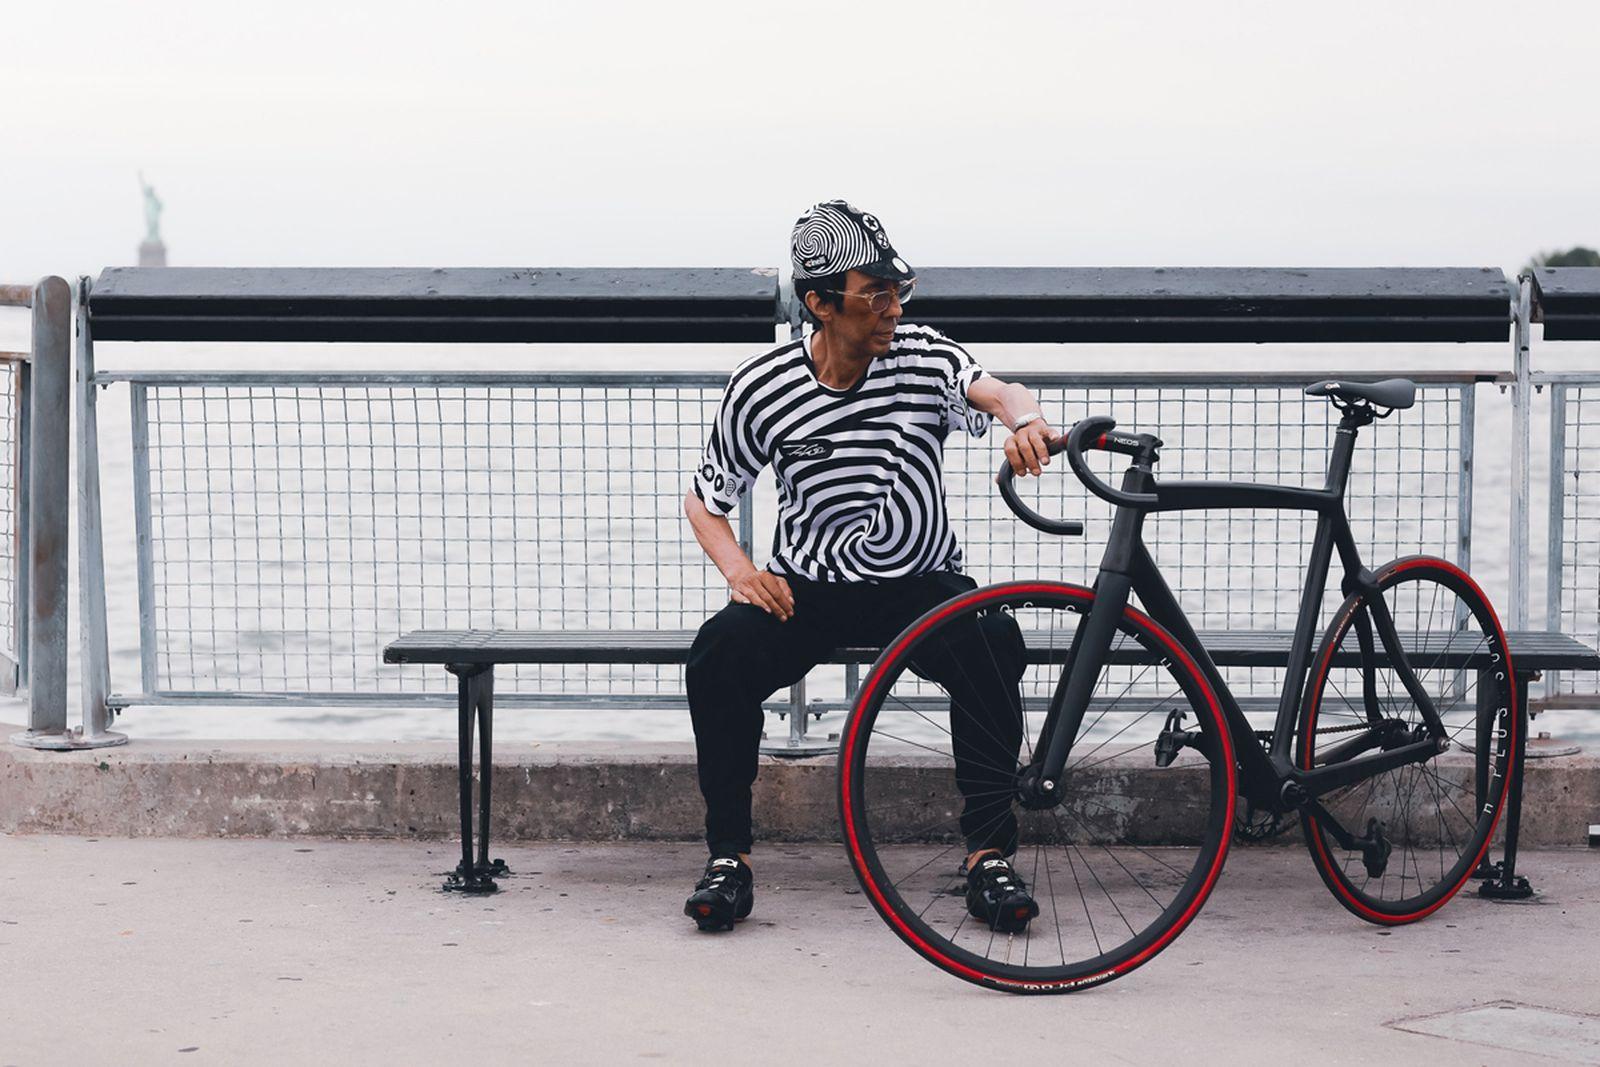 futura-cinelli-collab-apparel-bike (5)